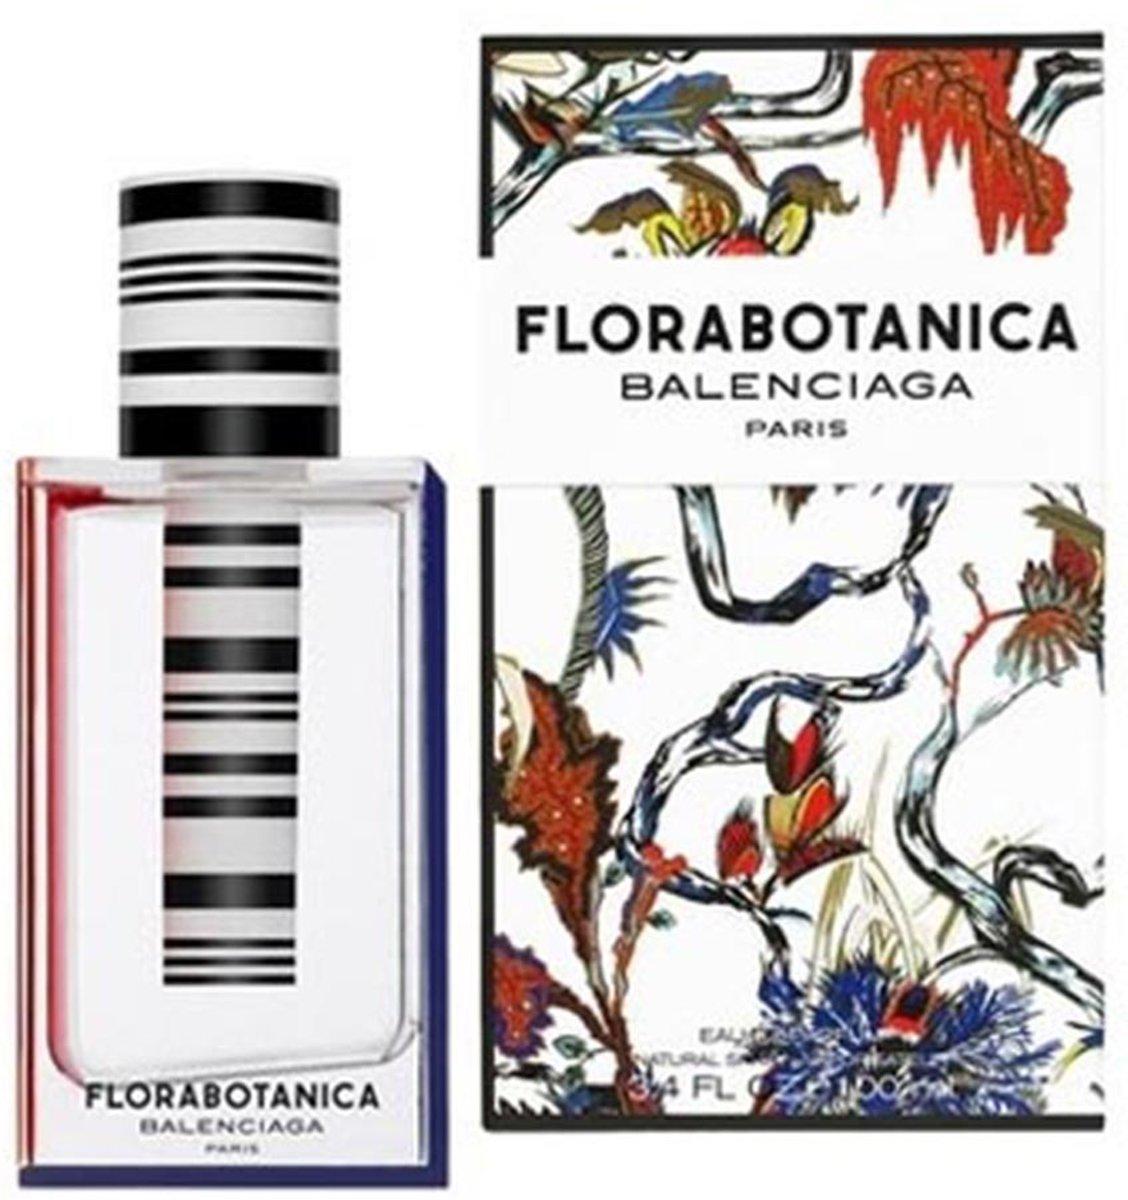 Balenciaga Florabotanica 100 ml - Eau de Parfum - Damesparfum kopen